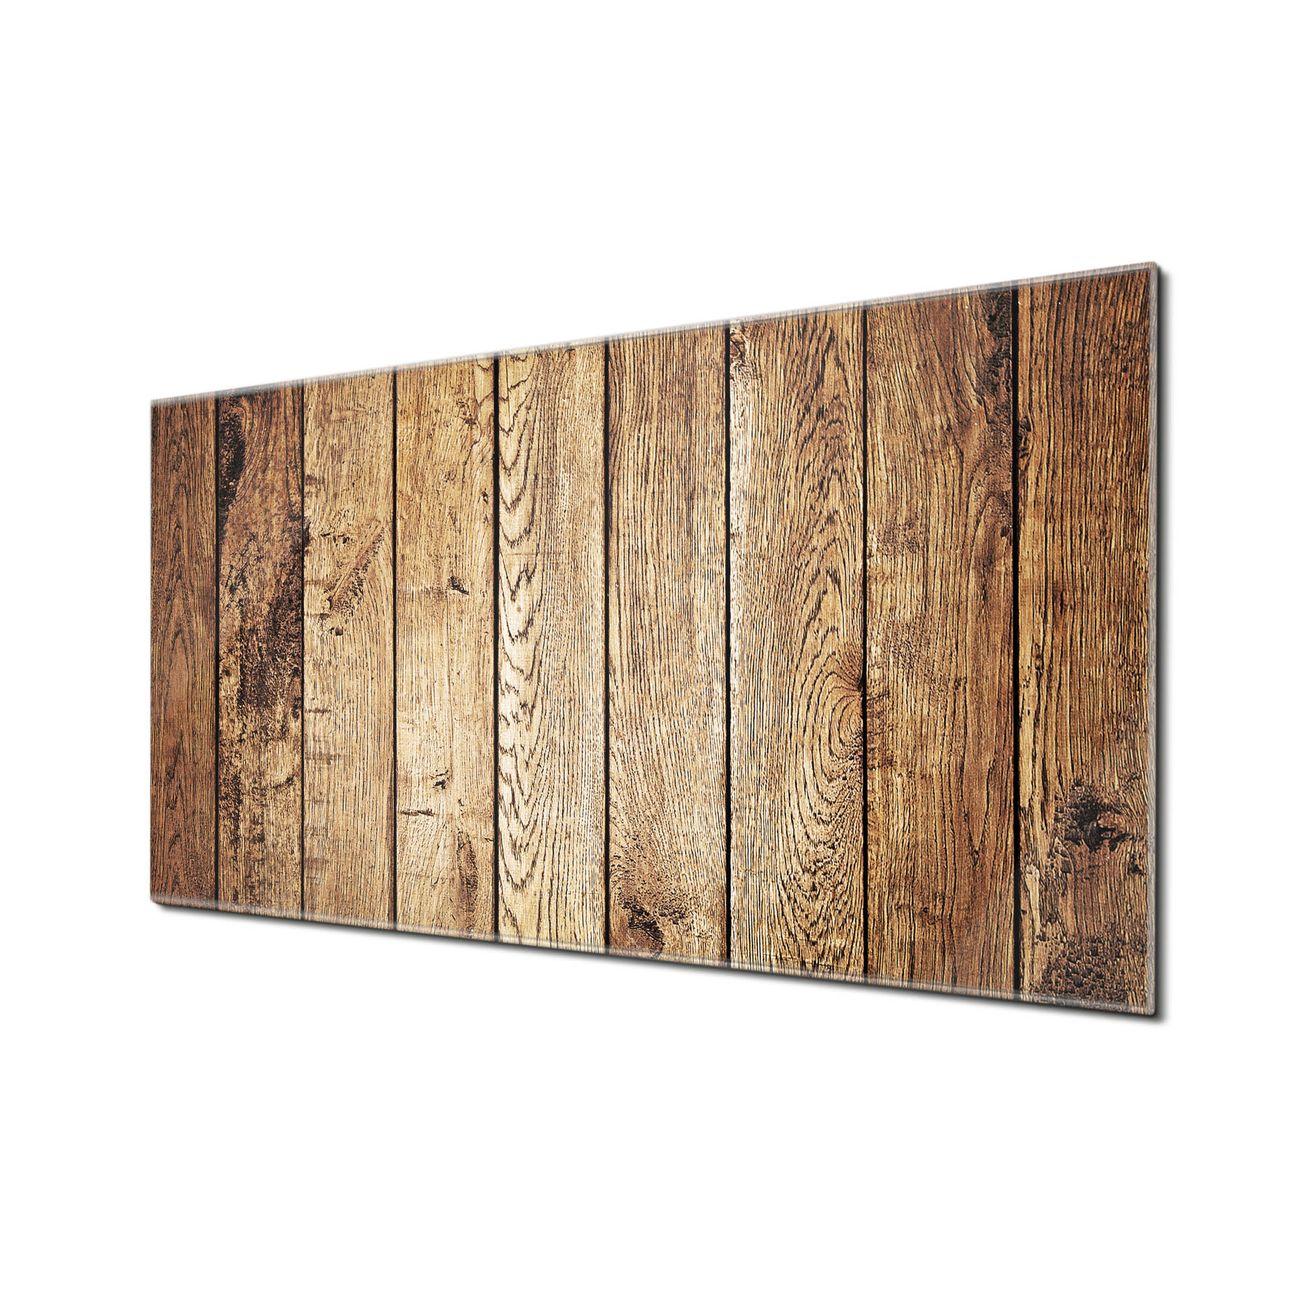 Küchenrückwand Glas Motiv Geöltes Holz